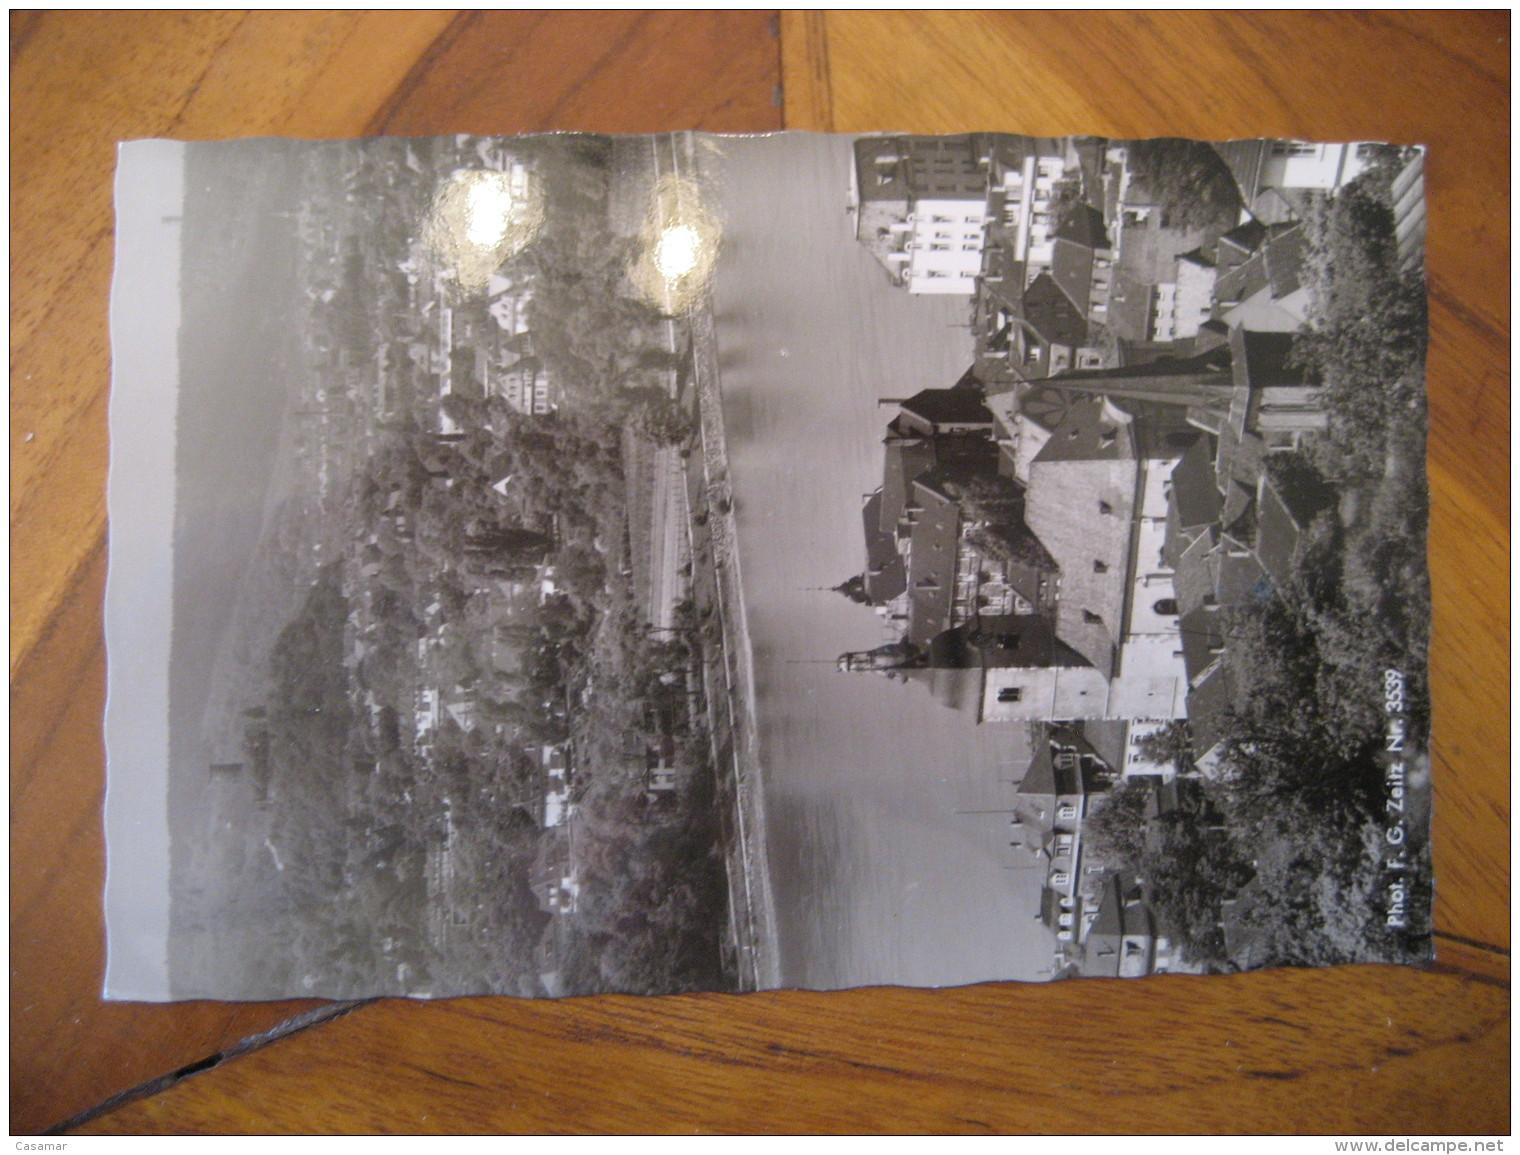 KONIGSWINTER Bad Godesberg Godesburg Post Card North Rhine Westphalia Koln Rhein Sieg Kries Germany - Koenigswinter